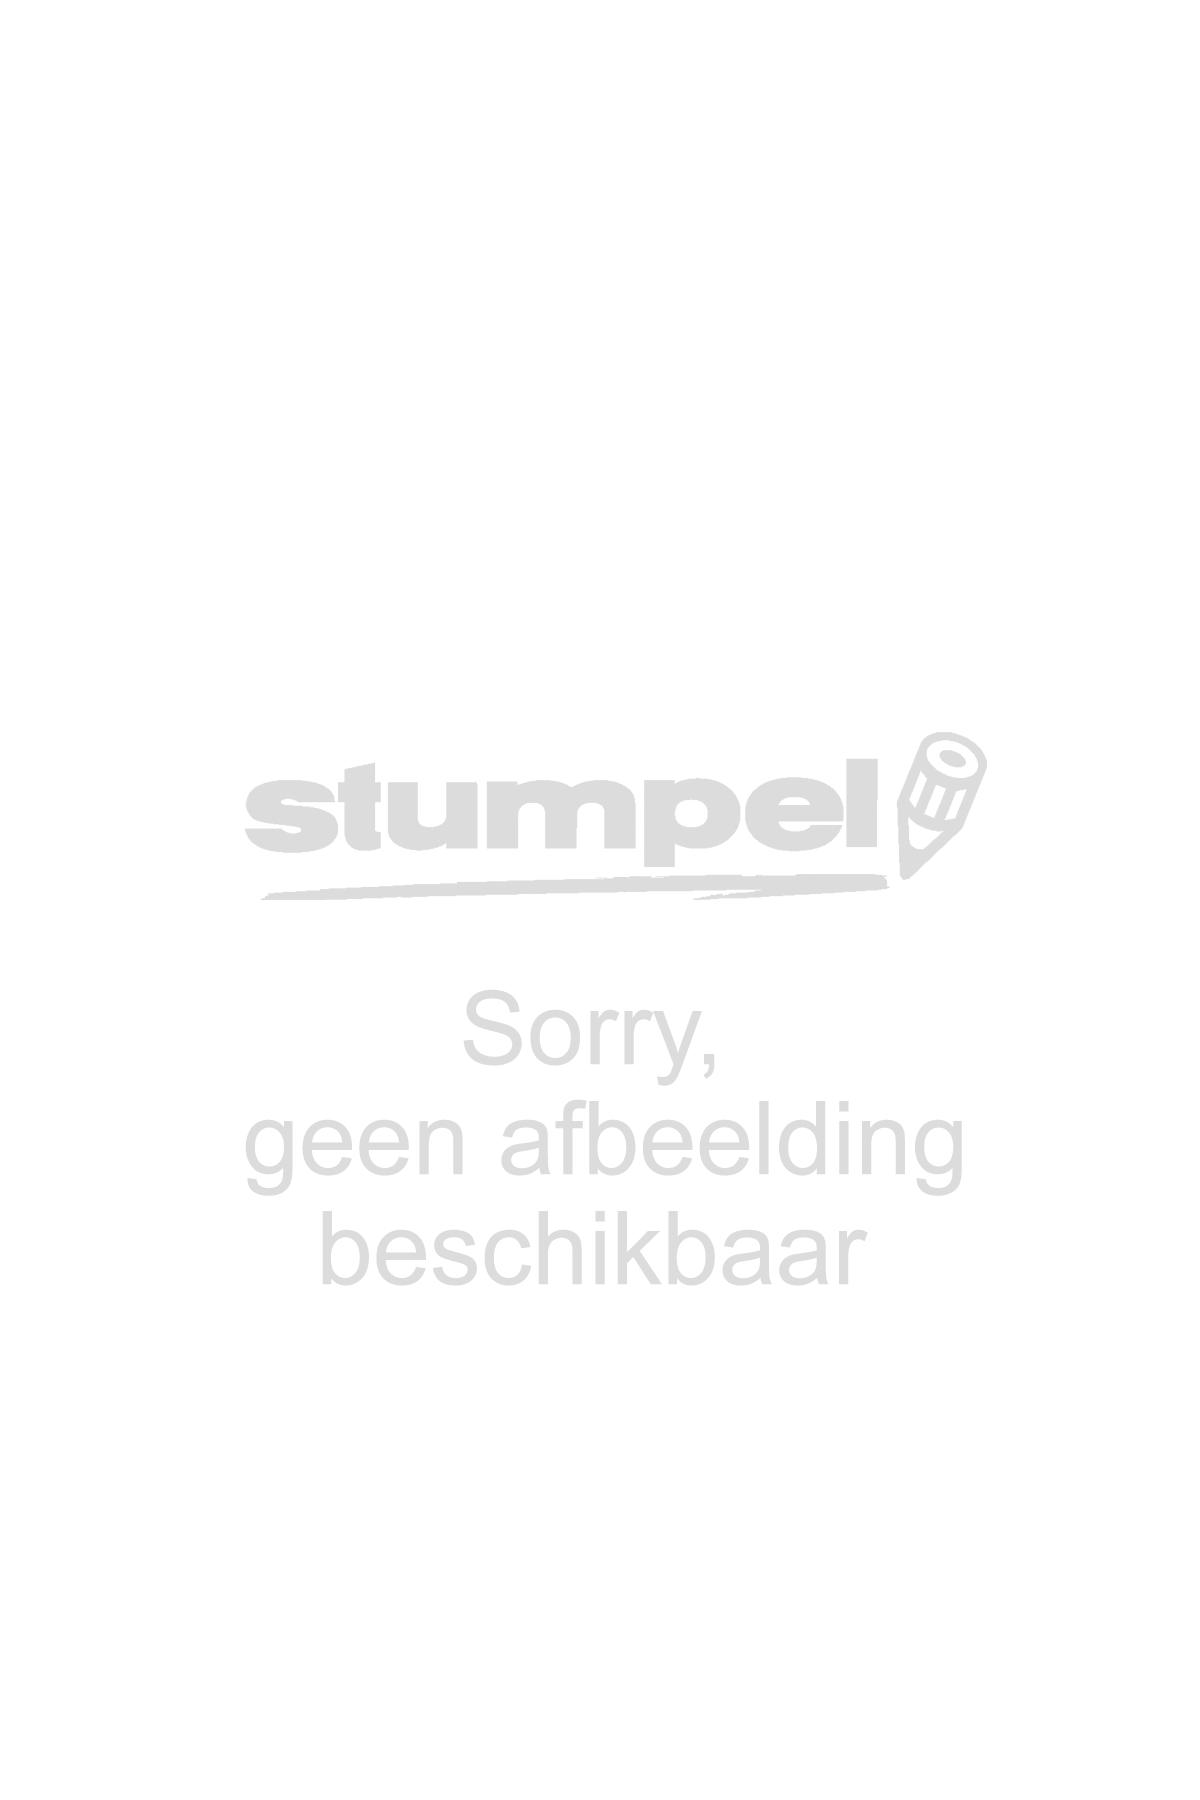 I-pad Slim cover Decoded for  the mini rood leer, Van der Spek